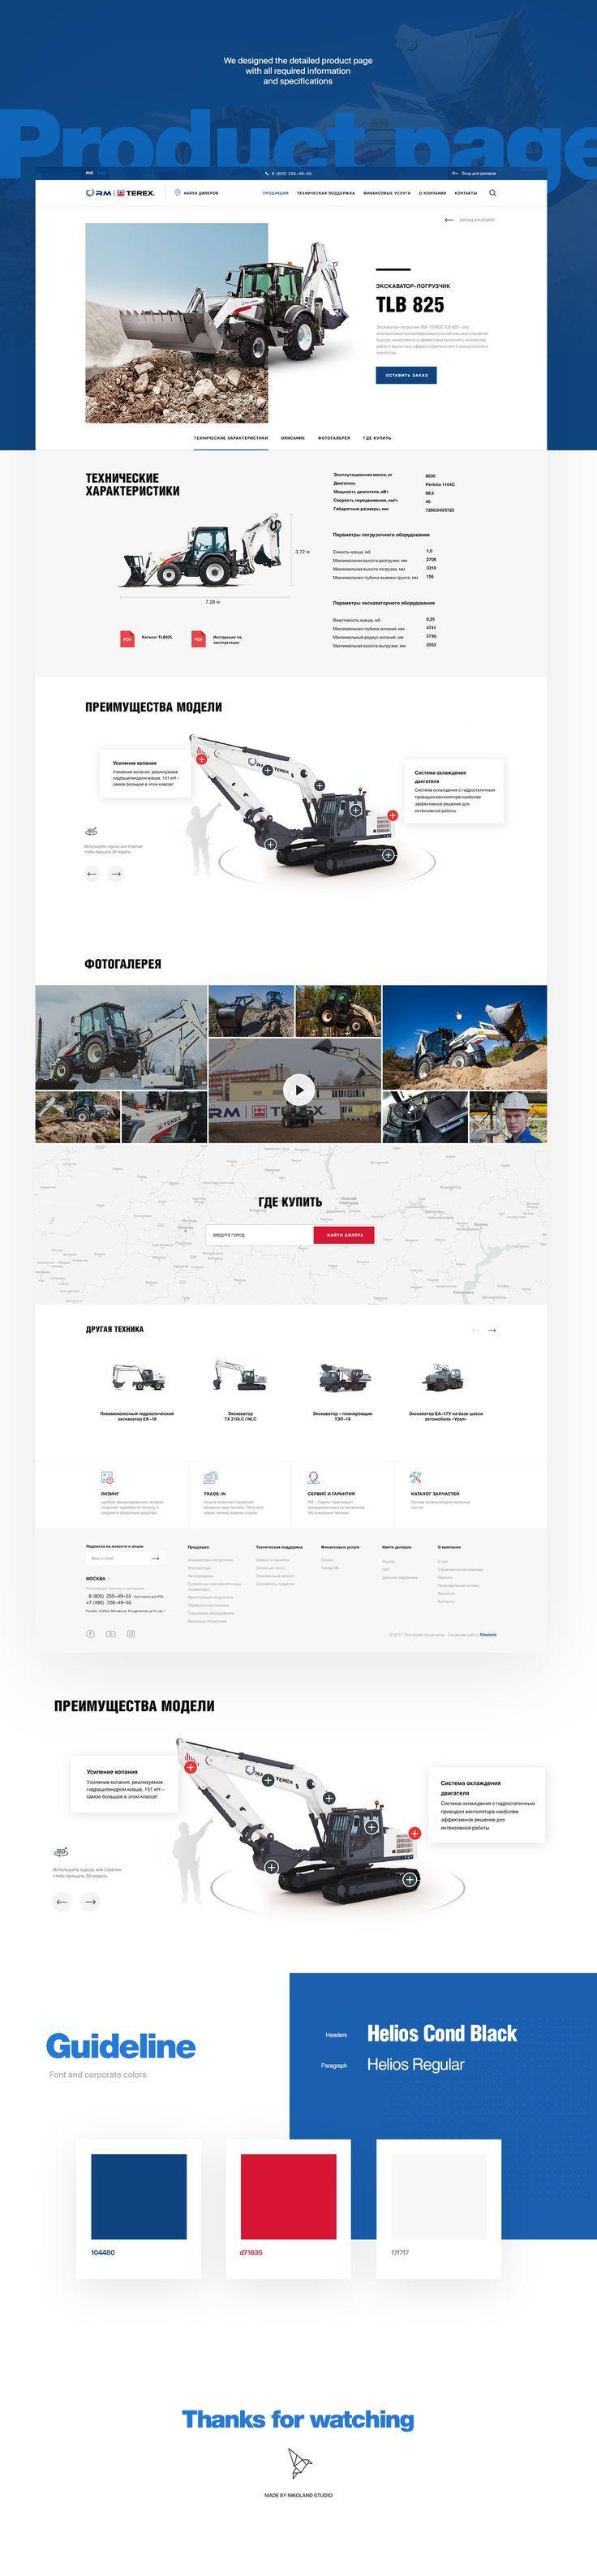 RM Terex. Corporate website.